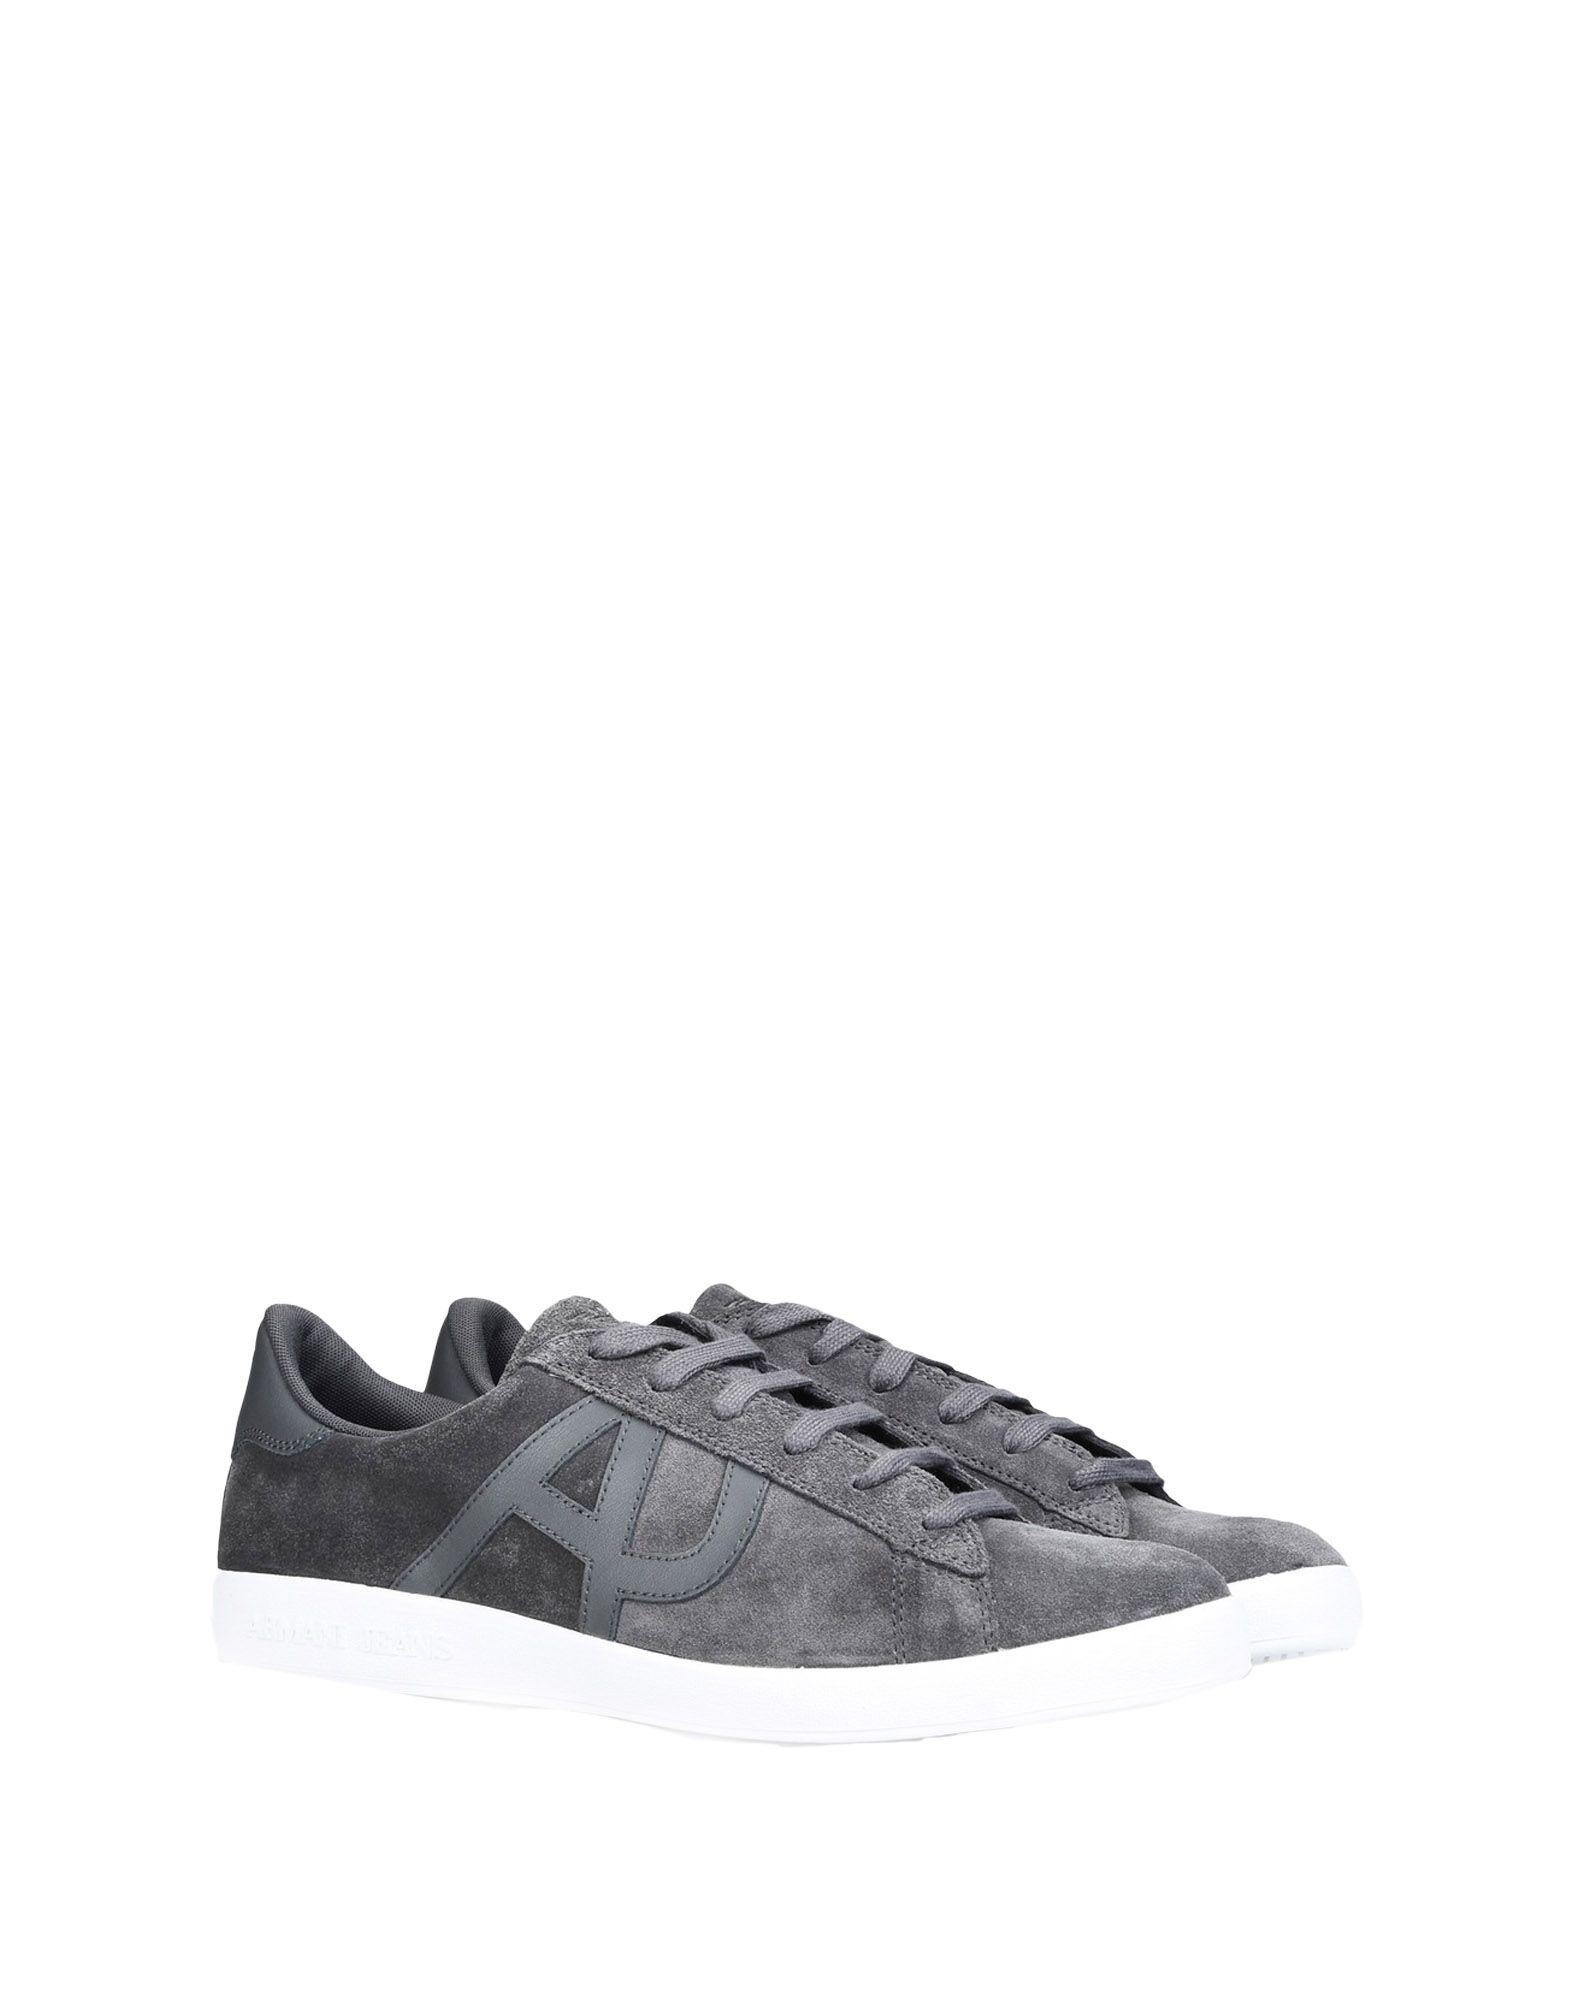 Sneakers Armani Jeans Uomo - 11270488PG